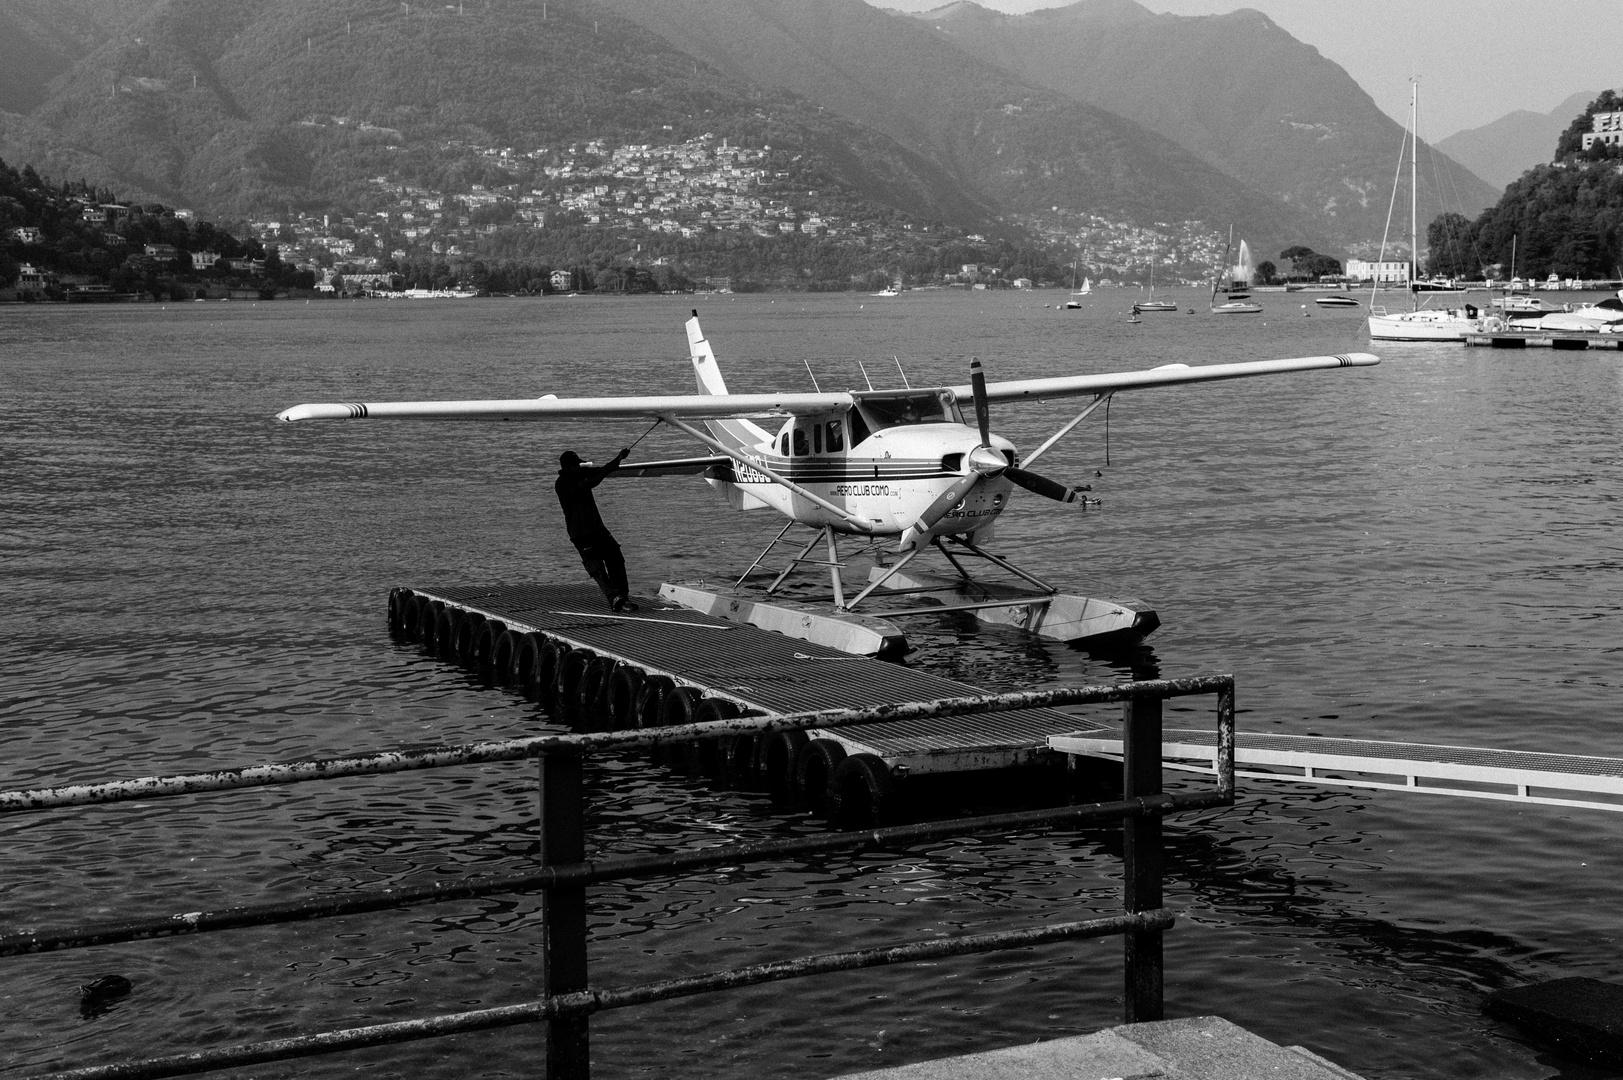 Como - Wasserflugzeug